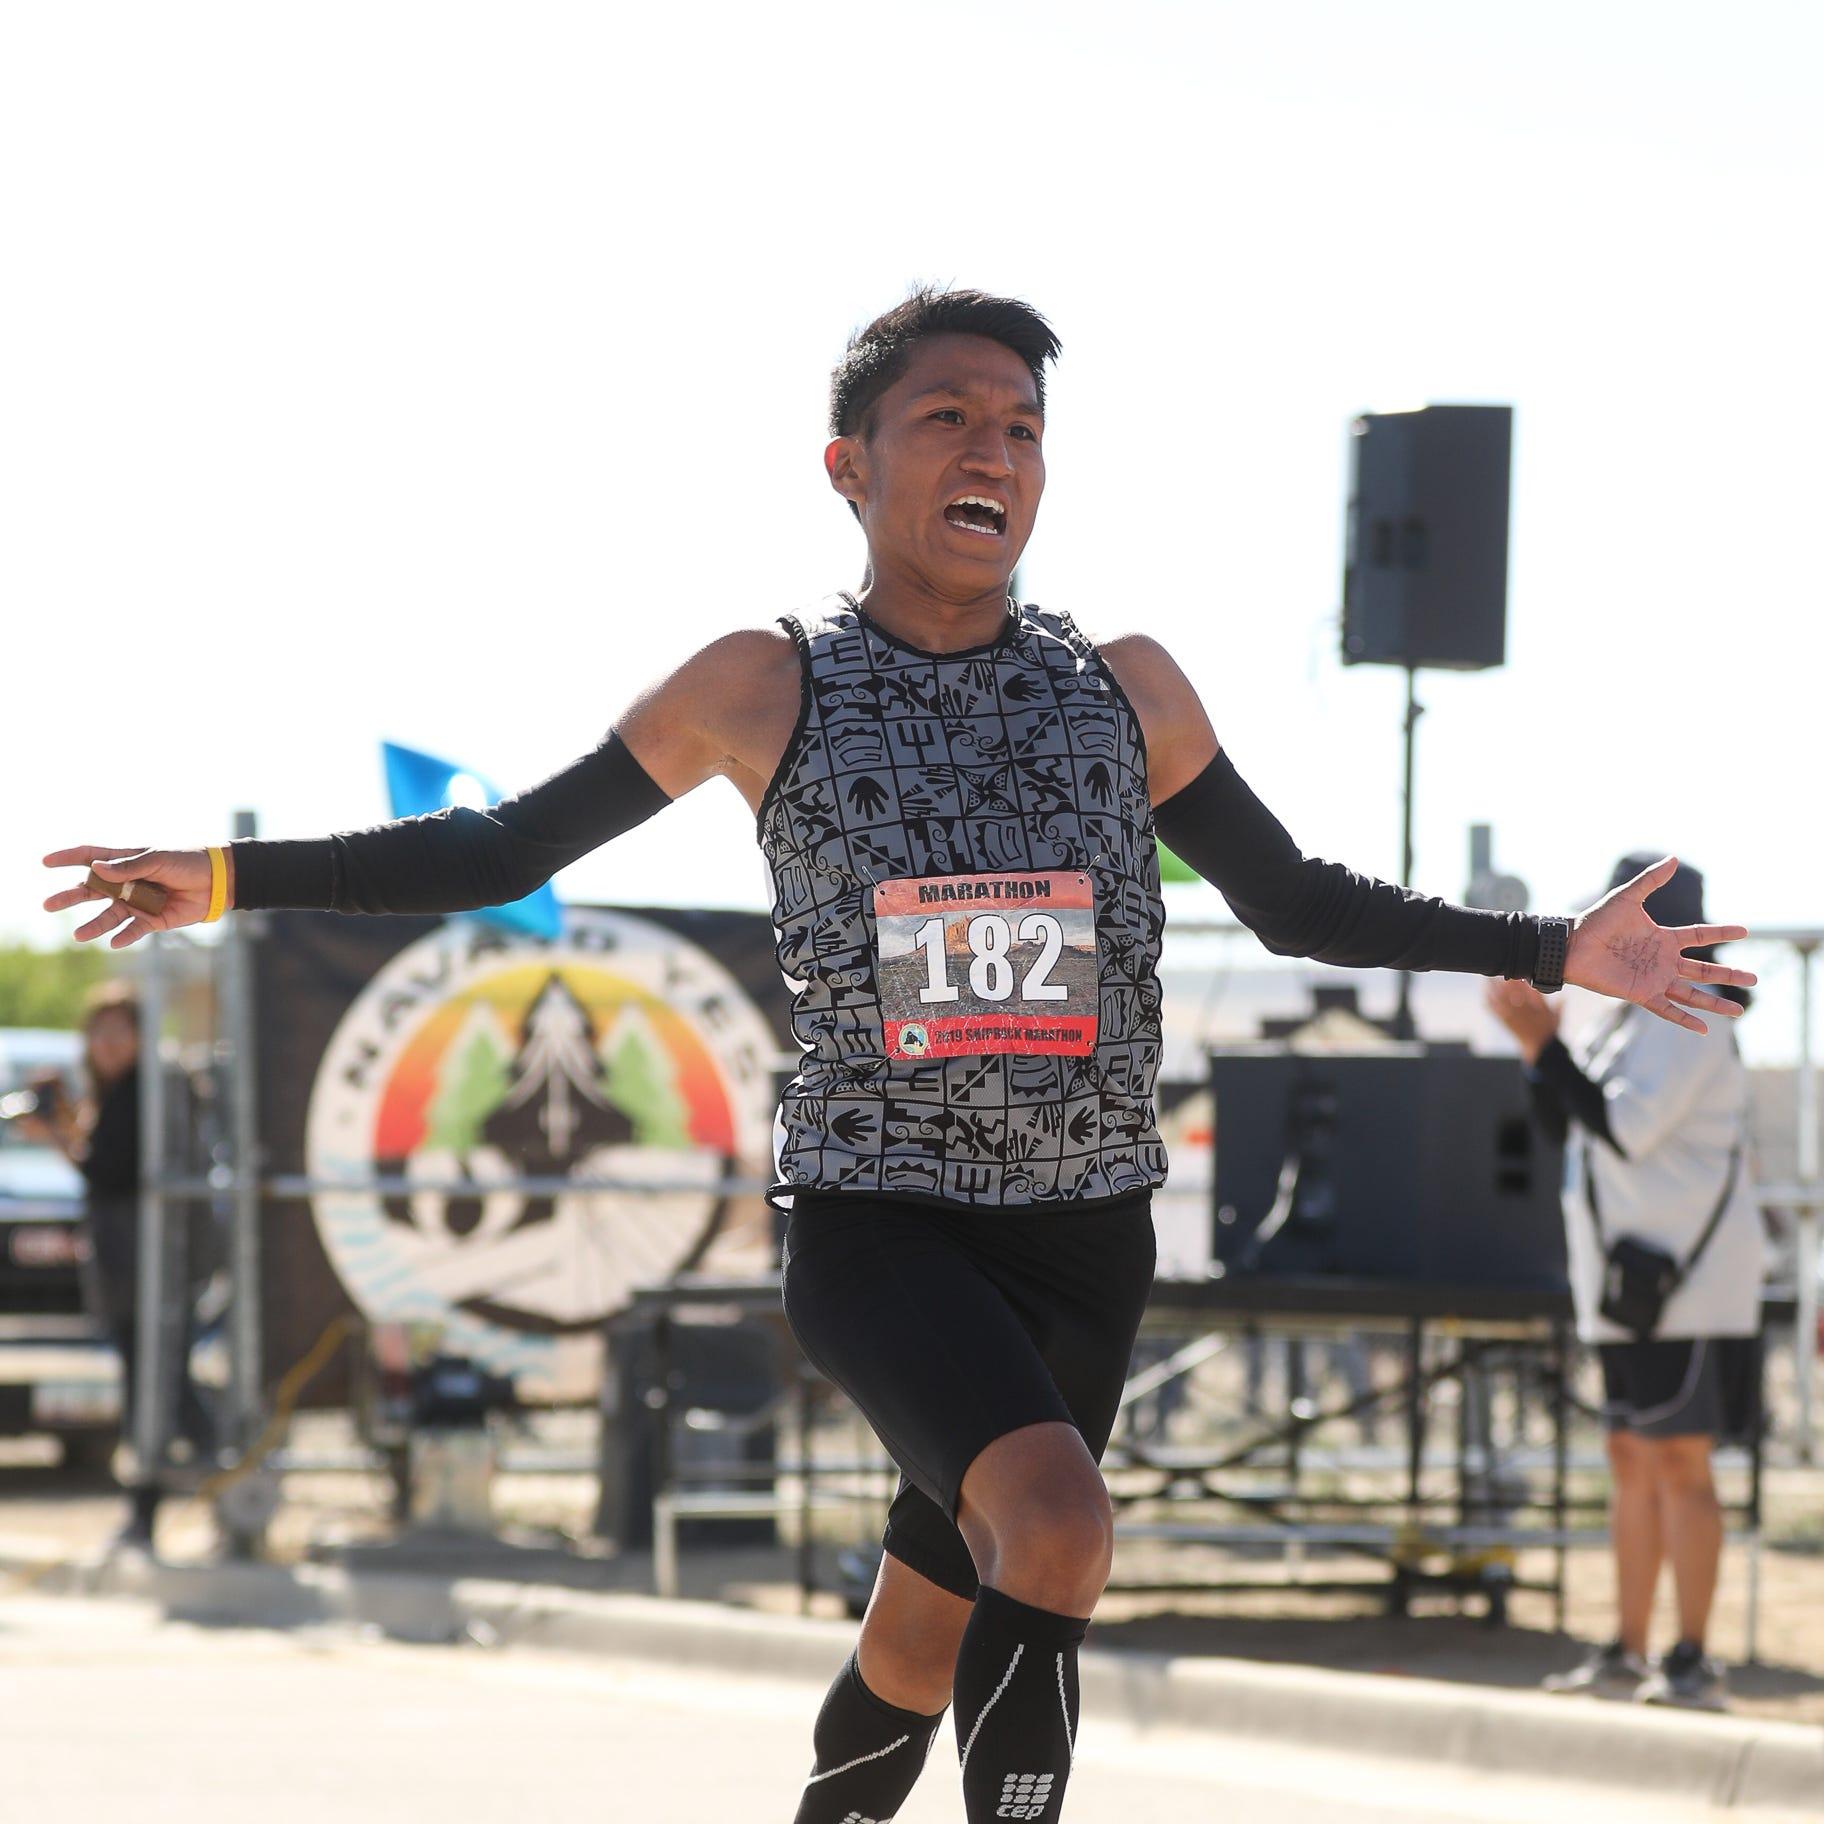 Sumatzkuku, Sekaquaptewa win Shiprock Marathon titles